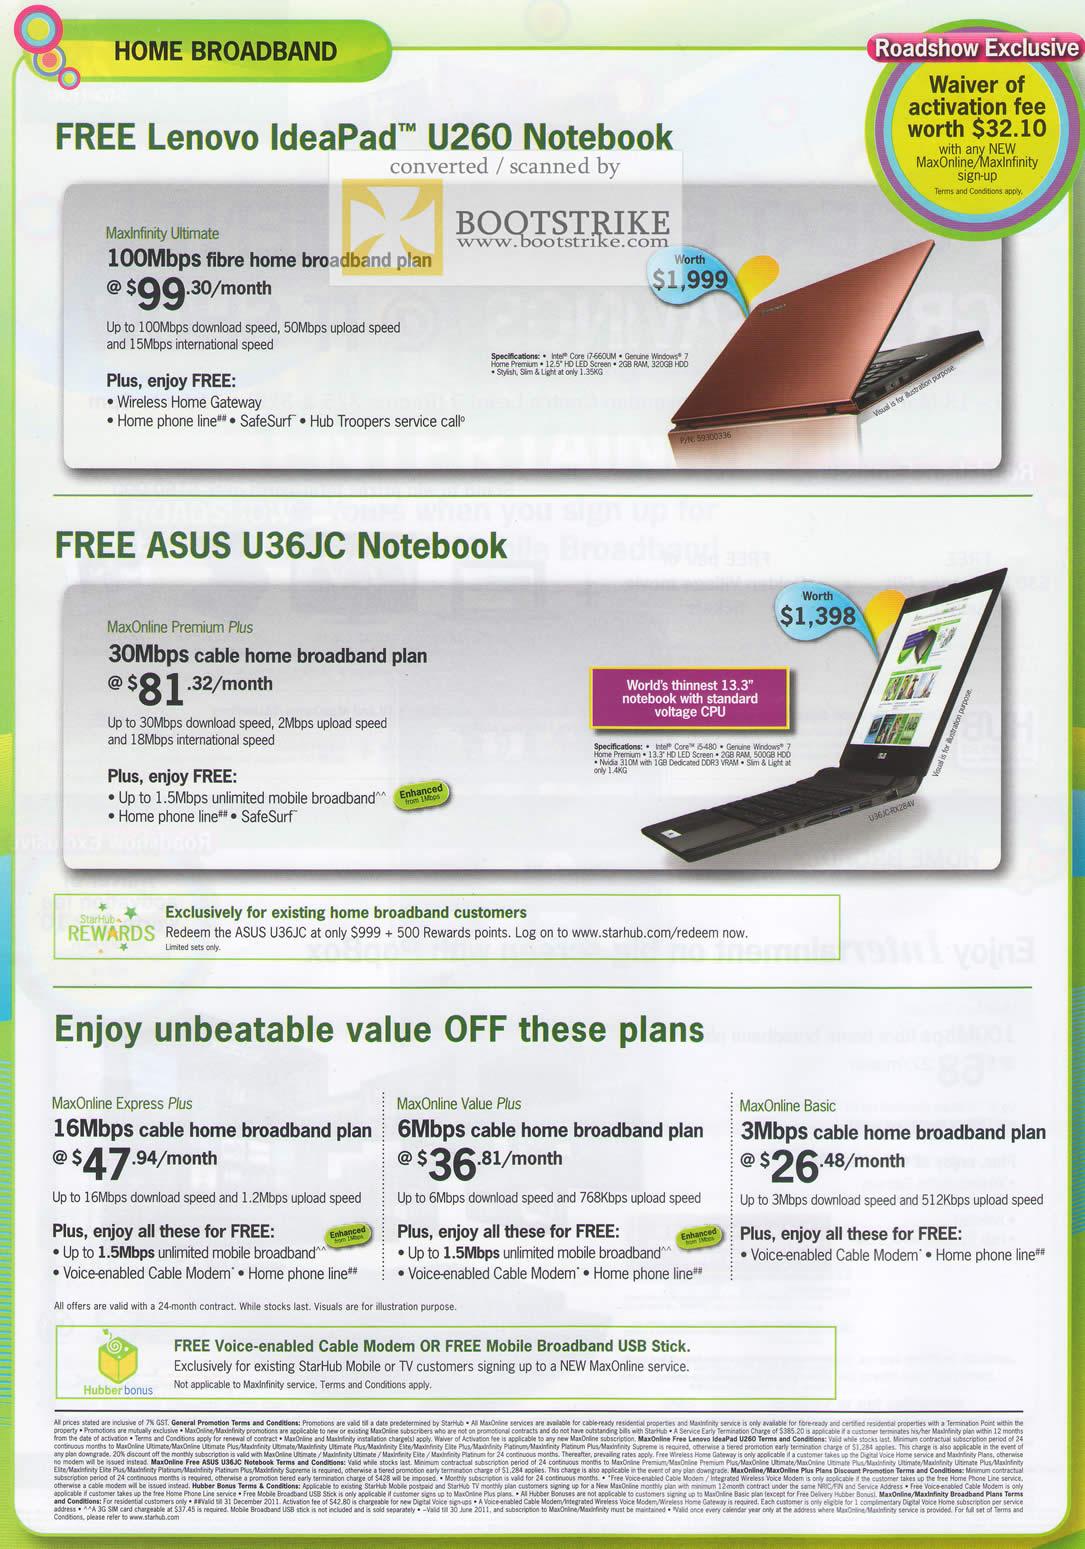 IT Show 2011 price list image brochure of Starhub Lenovo Ideapad U260 ASUS U36JC Fibre Maxonline Express Value Basic